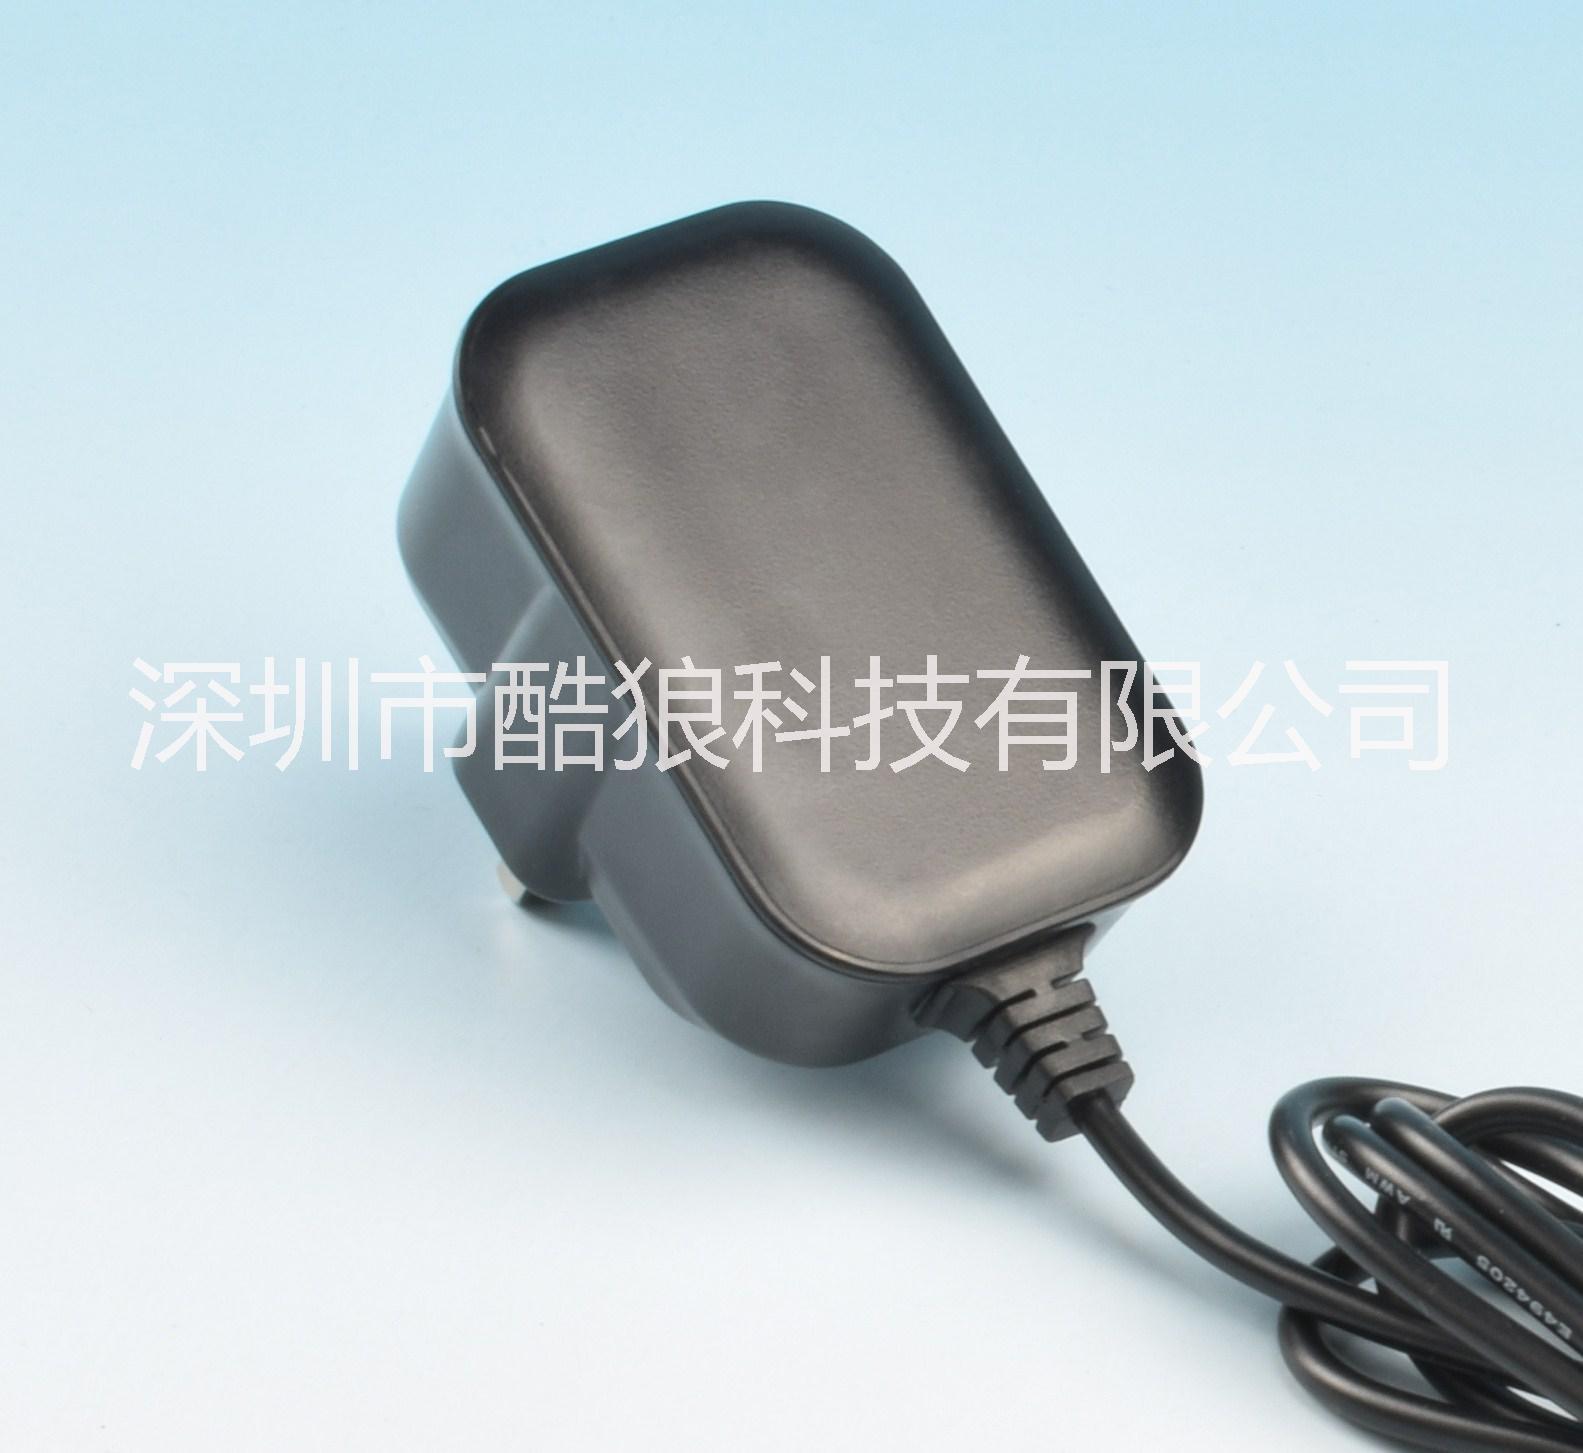 4v1a英规电池充电器 英规18650锂电池充电器 恒流转灯充电器 聚合物电